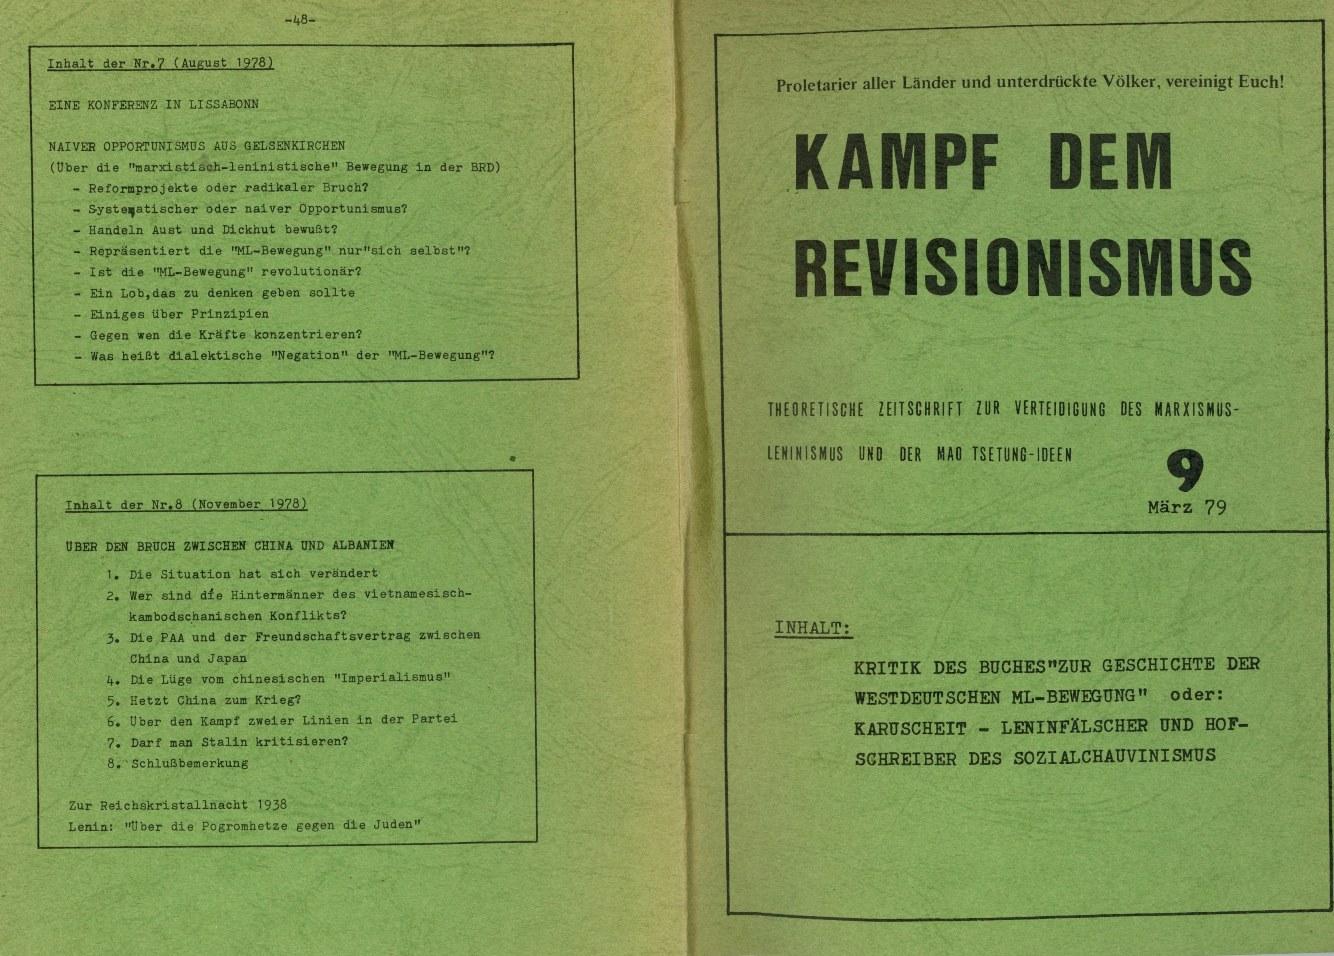 Muenchen_Kampf_dem_Revisionismus_1979_09_01